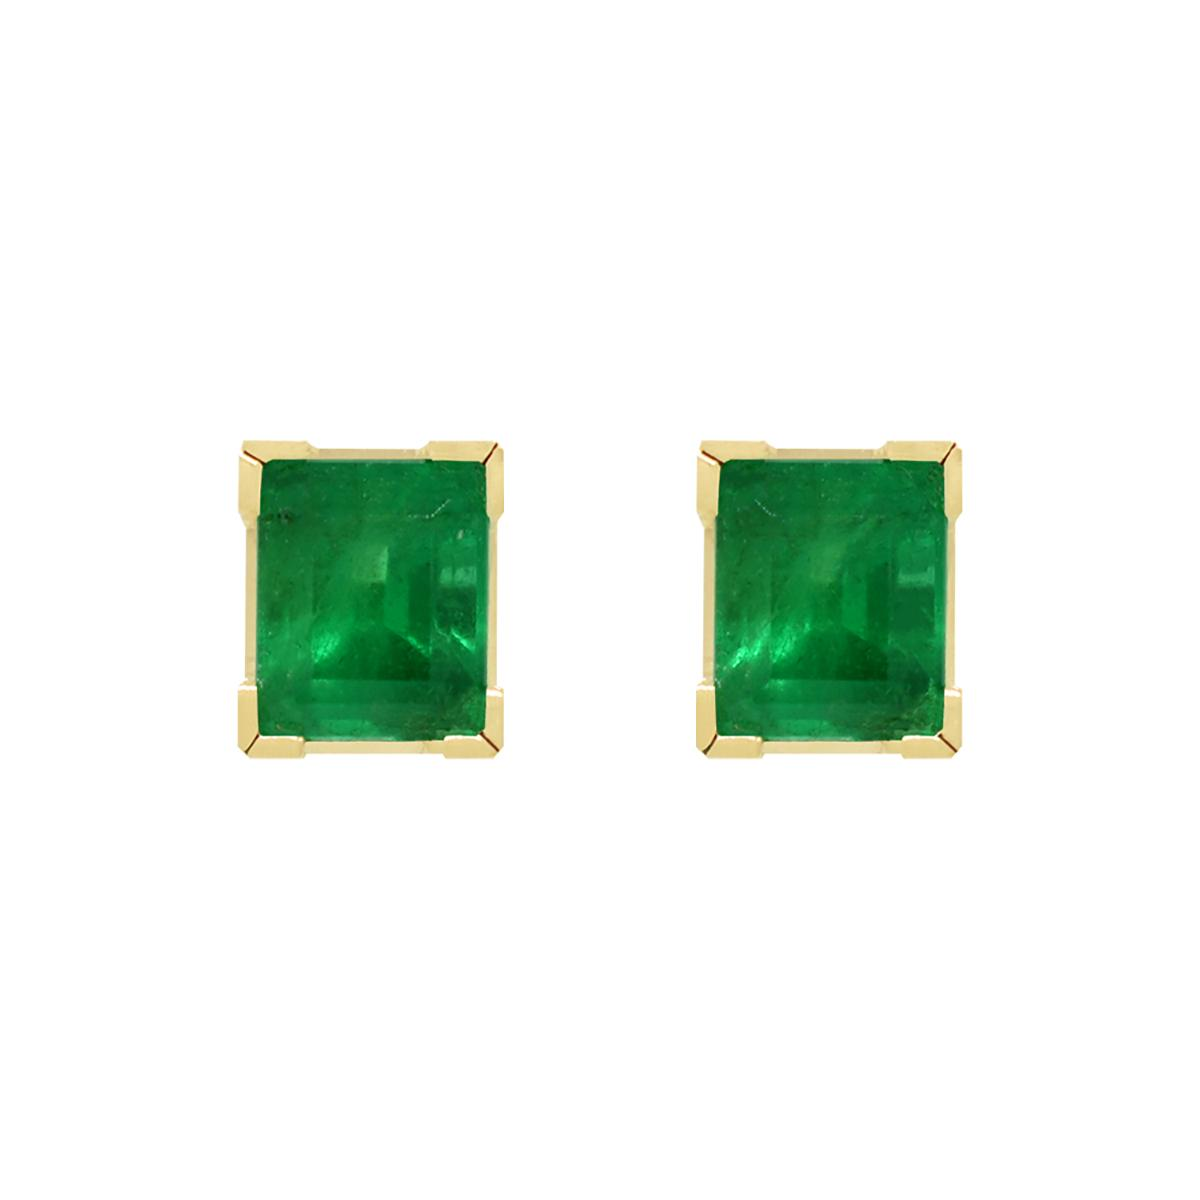 stud-emerald-earrings-in-classic-18k-yellow-gold-square-shape-stud-earrings